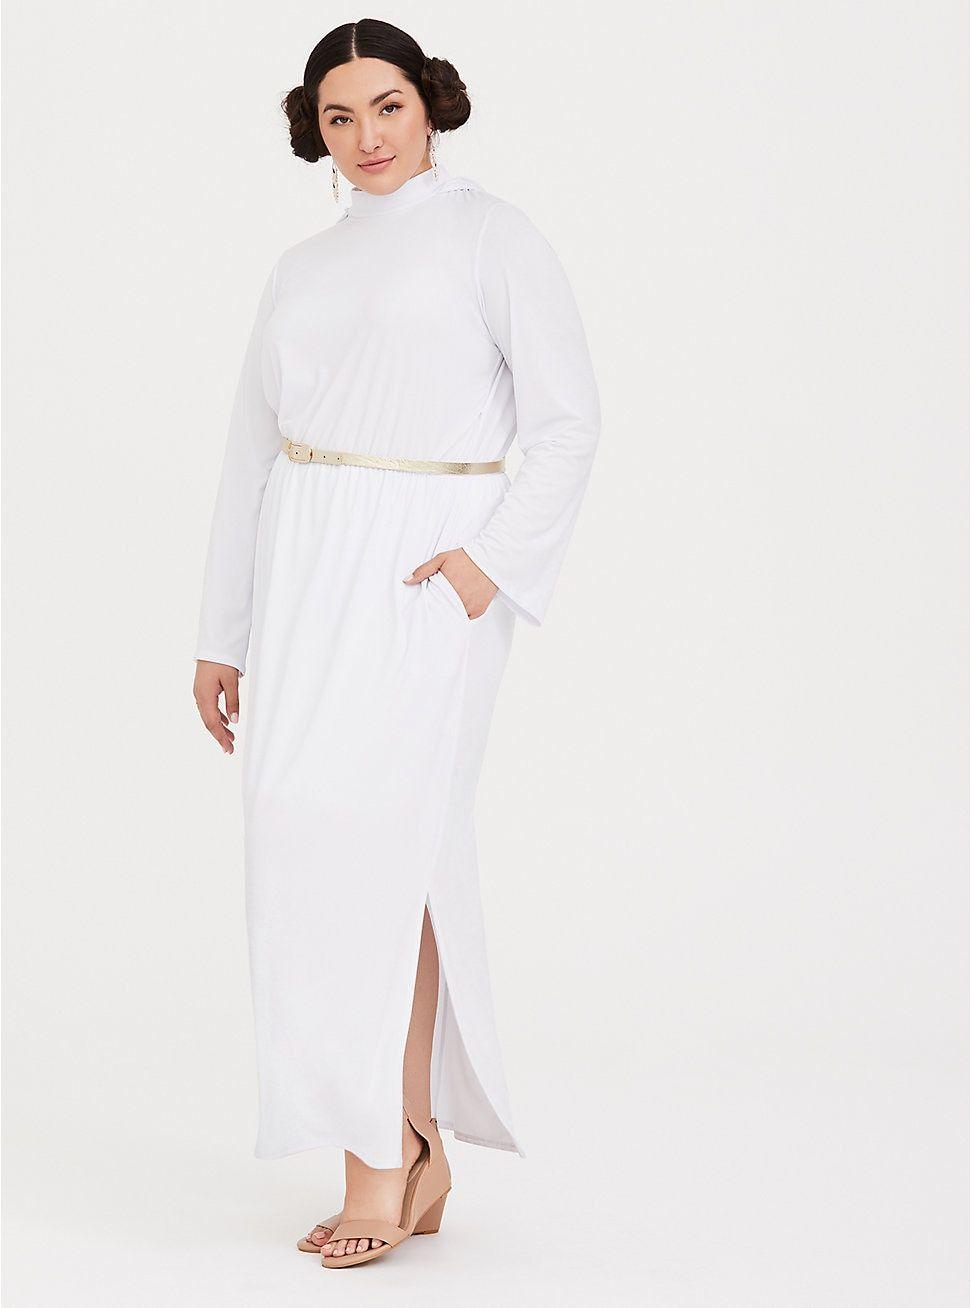 star wars princess leia white maxi dress yumi pinterest rh pinterest com